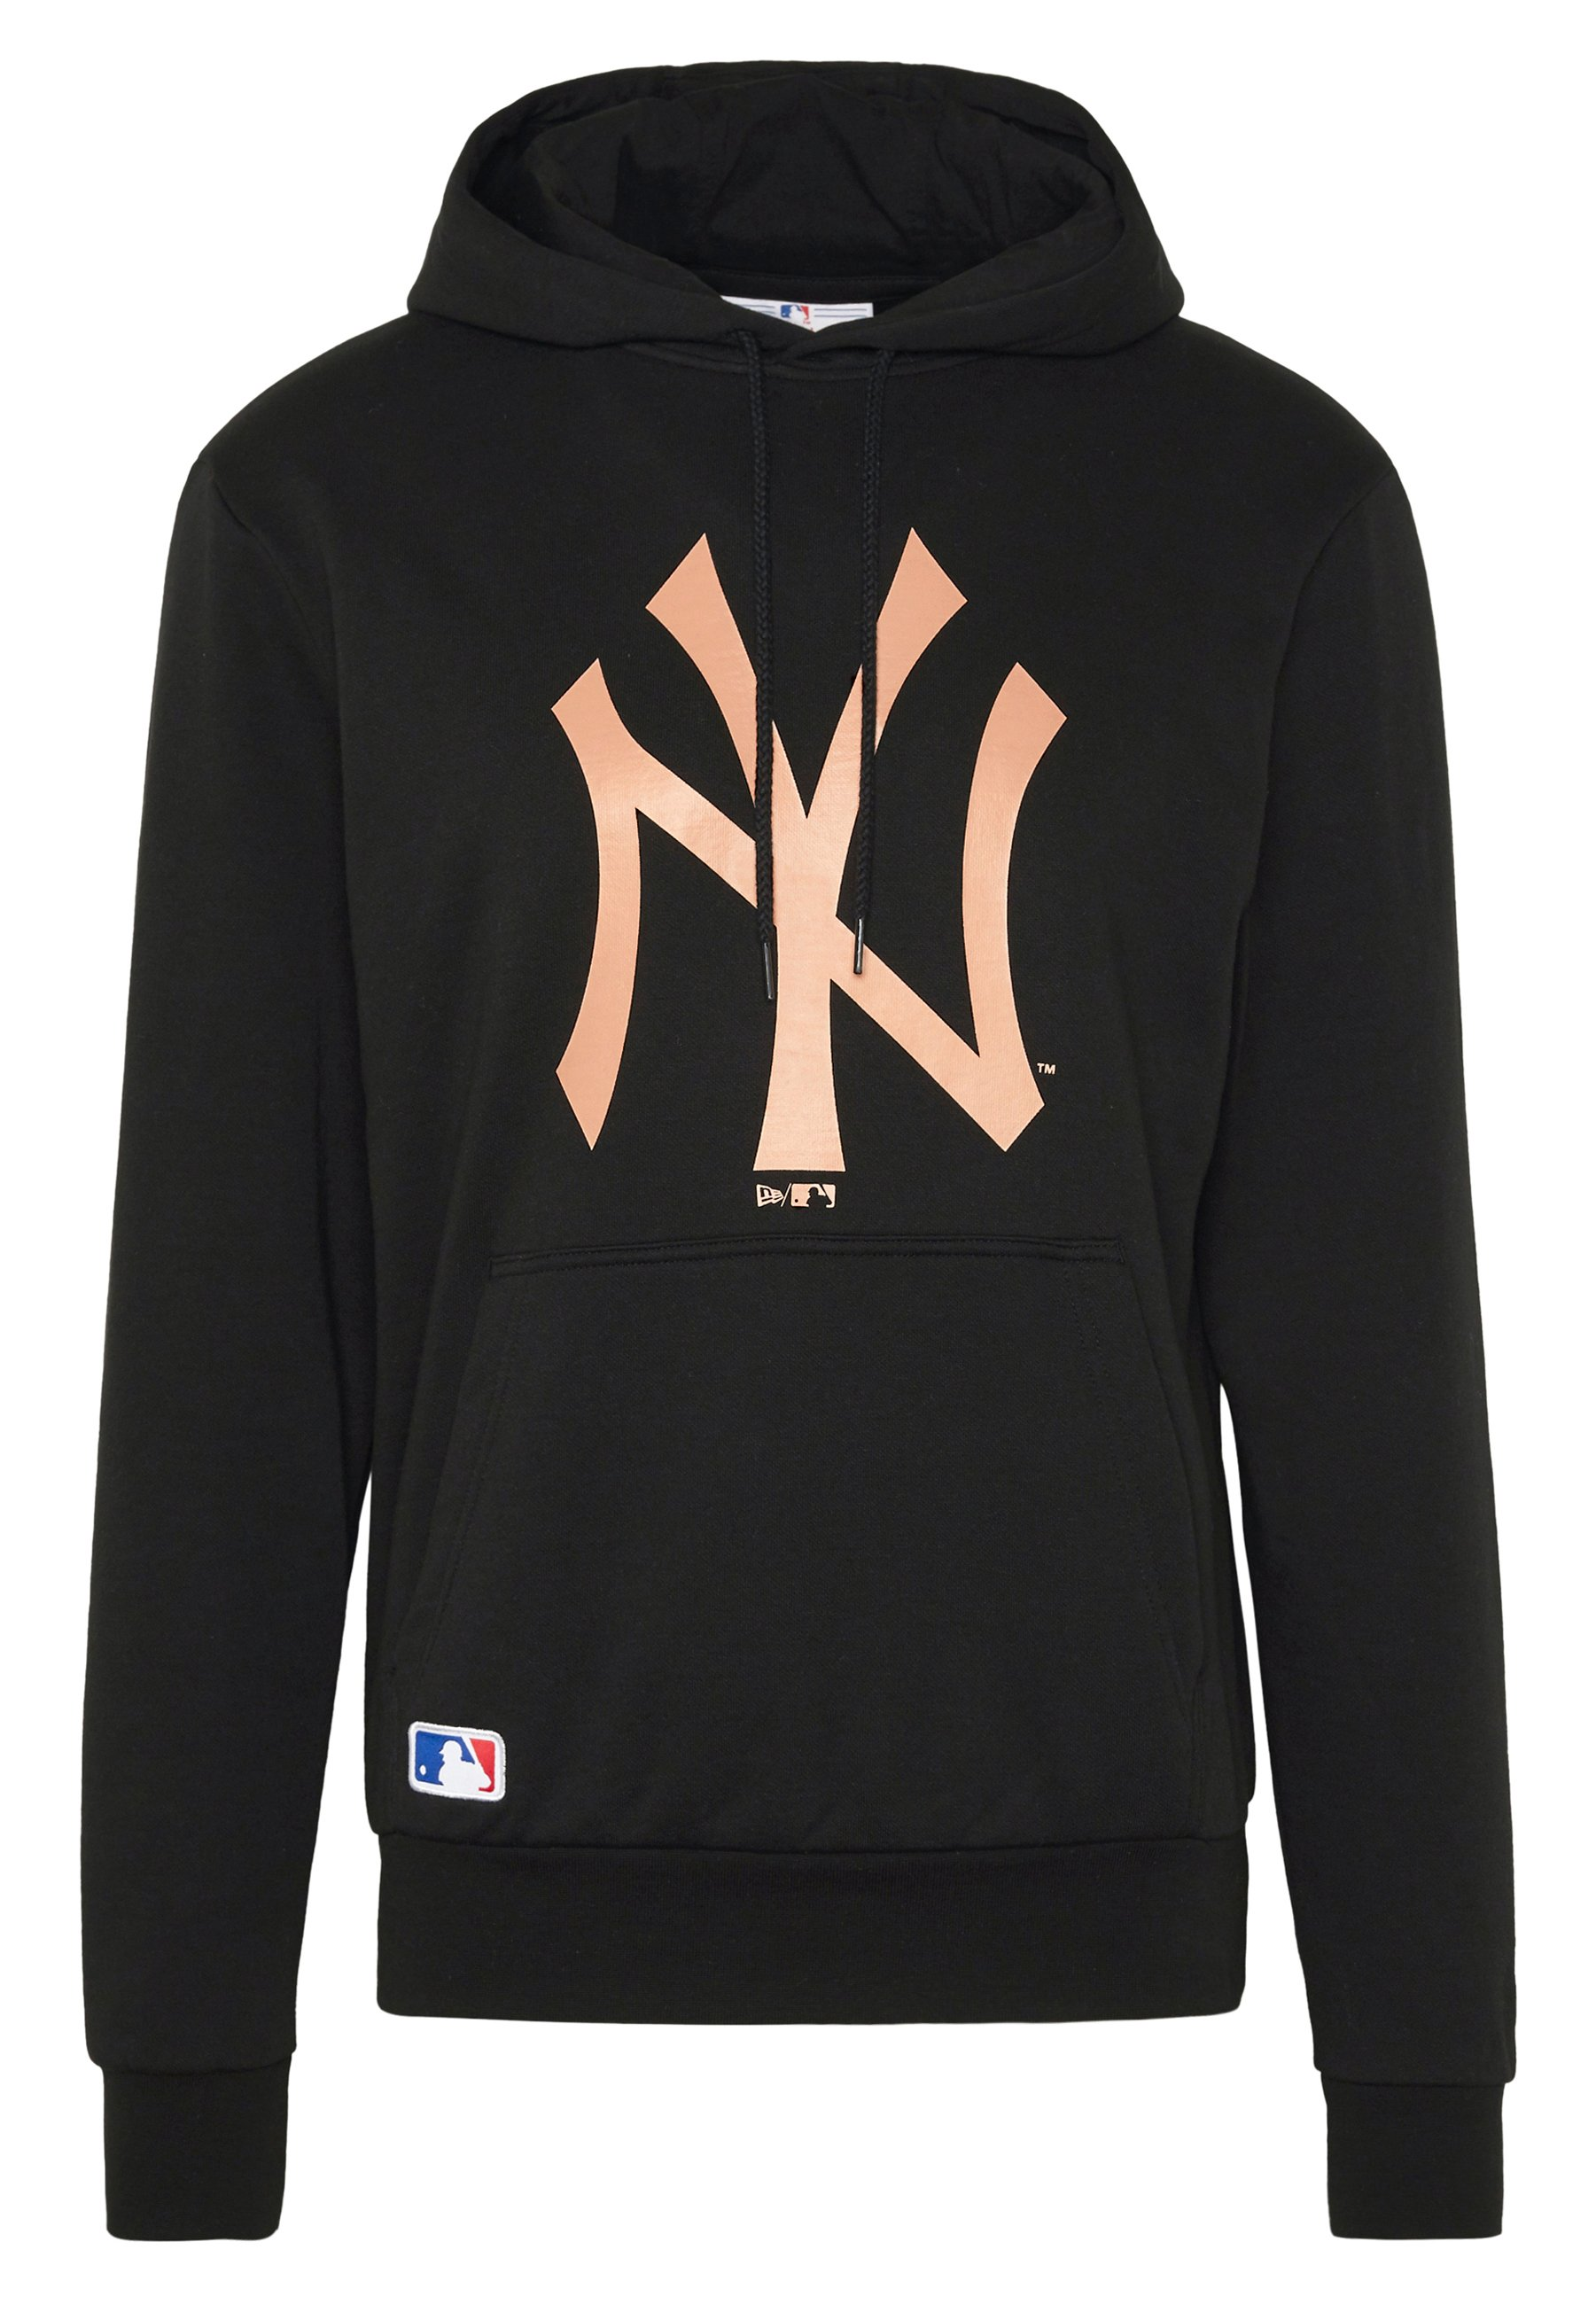 New Era MLB SEASONAL TEAM LOGO HOODY NEW YORK YANKEES - Artykuły klubowe - black